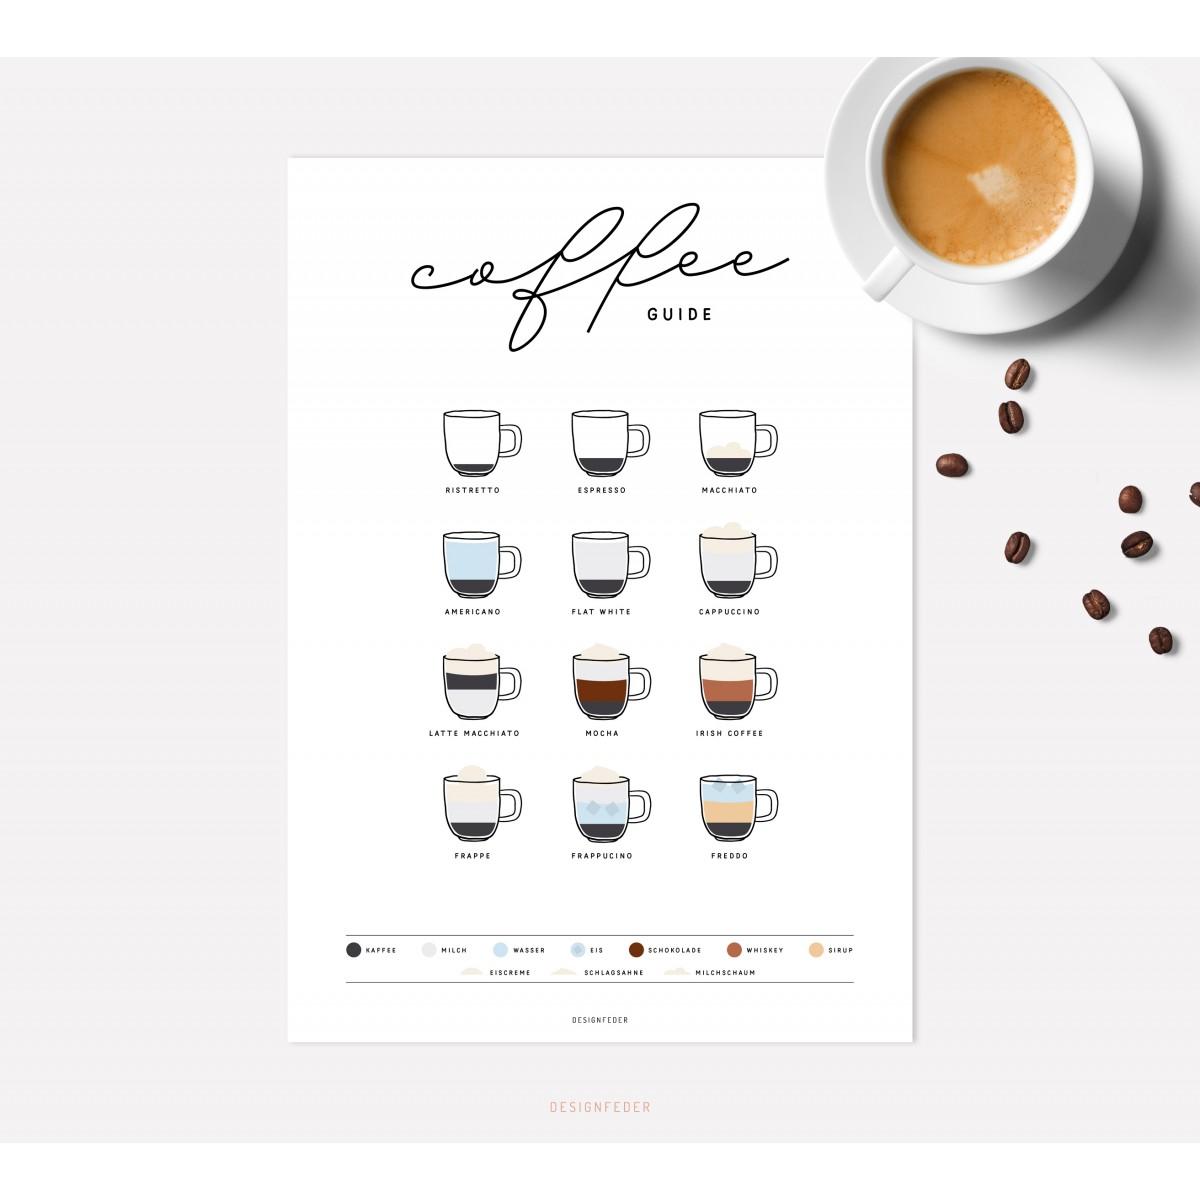 designfeder | Poster Coffee guide